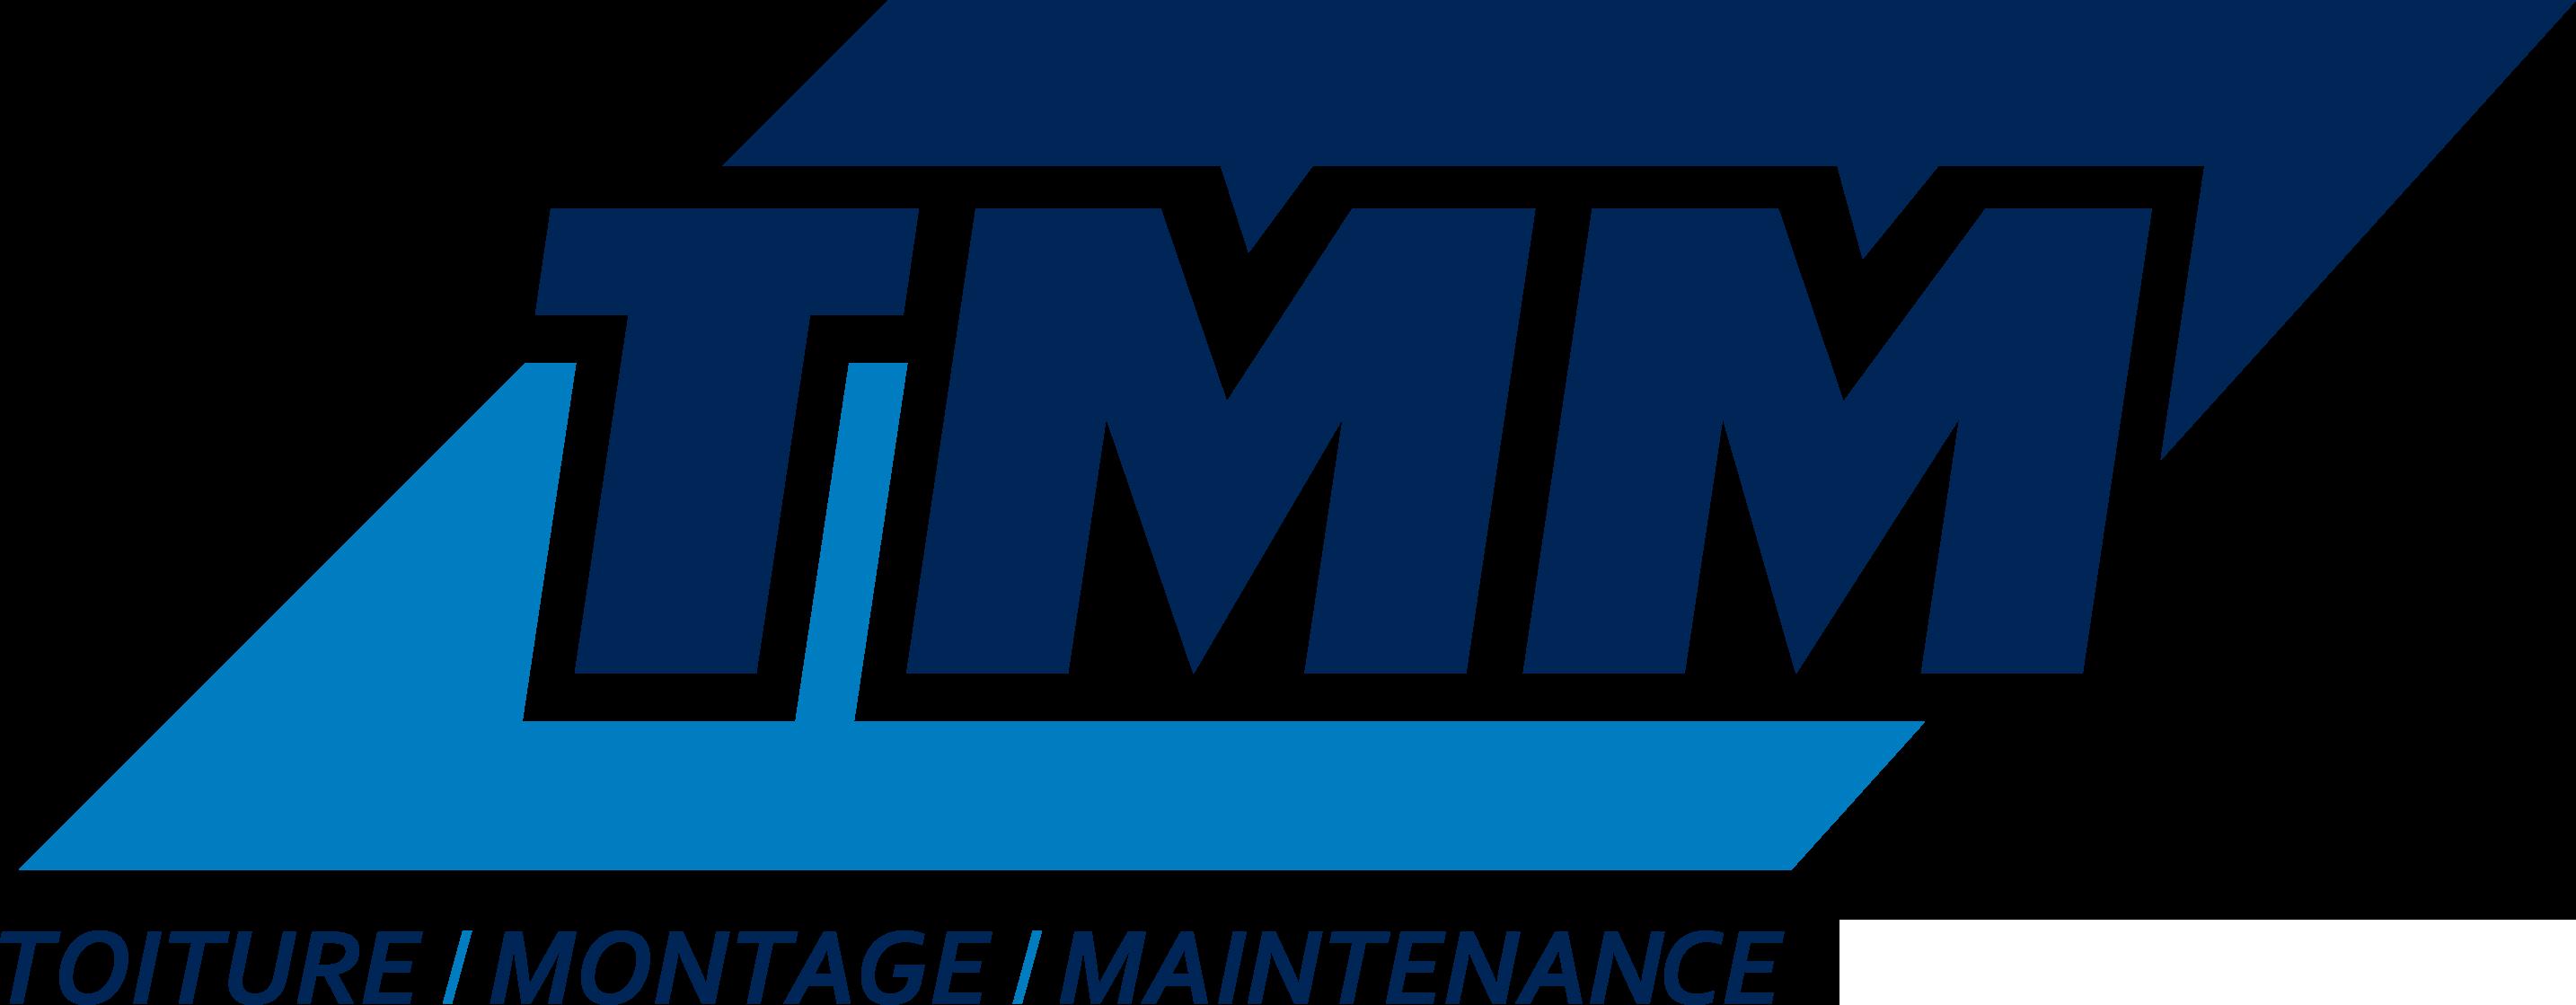 Toiture Montage Maintenance